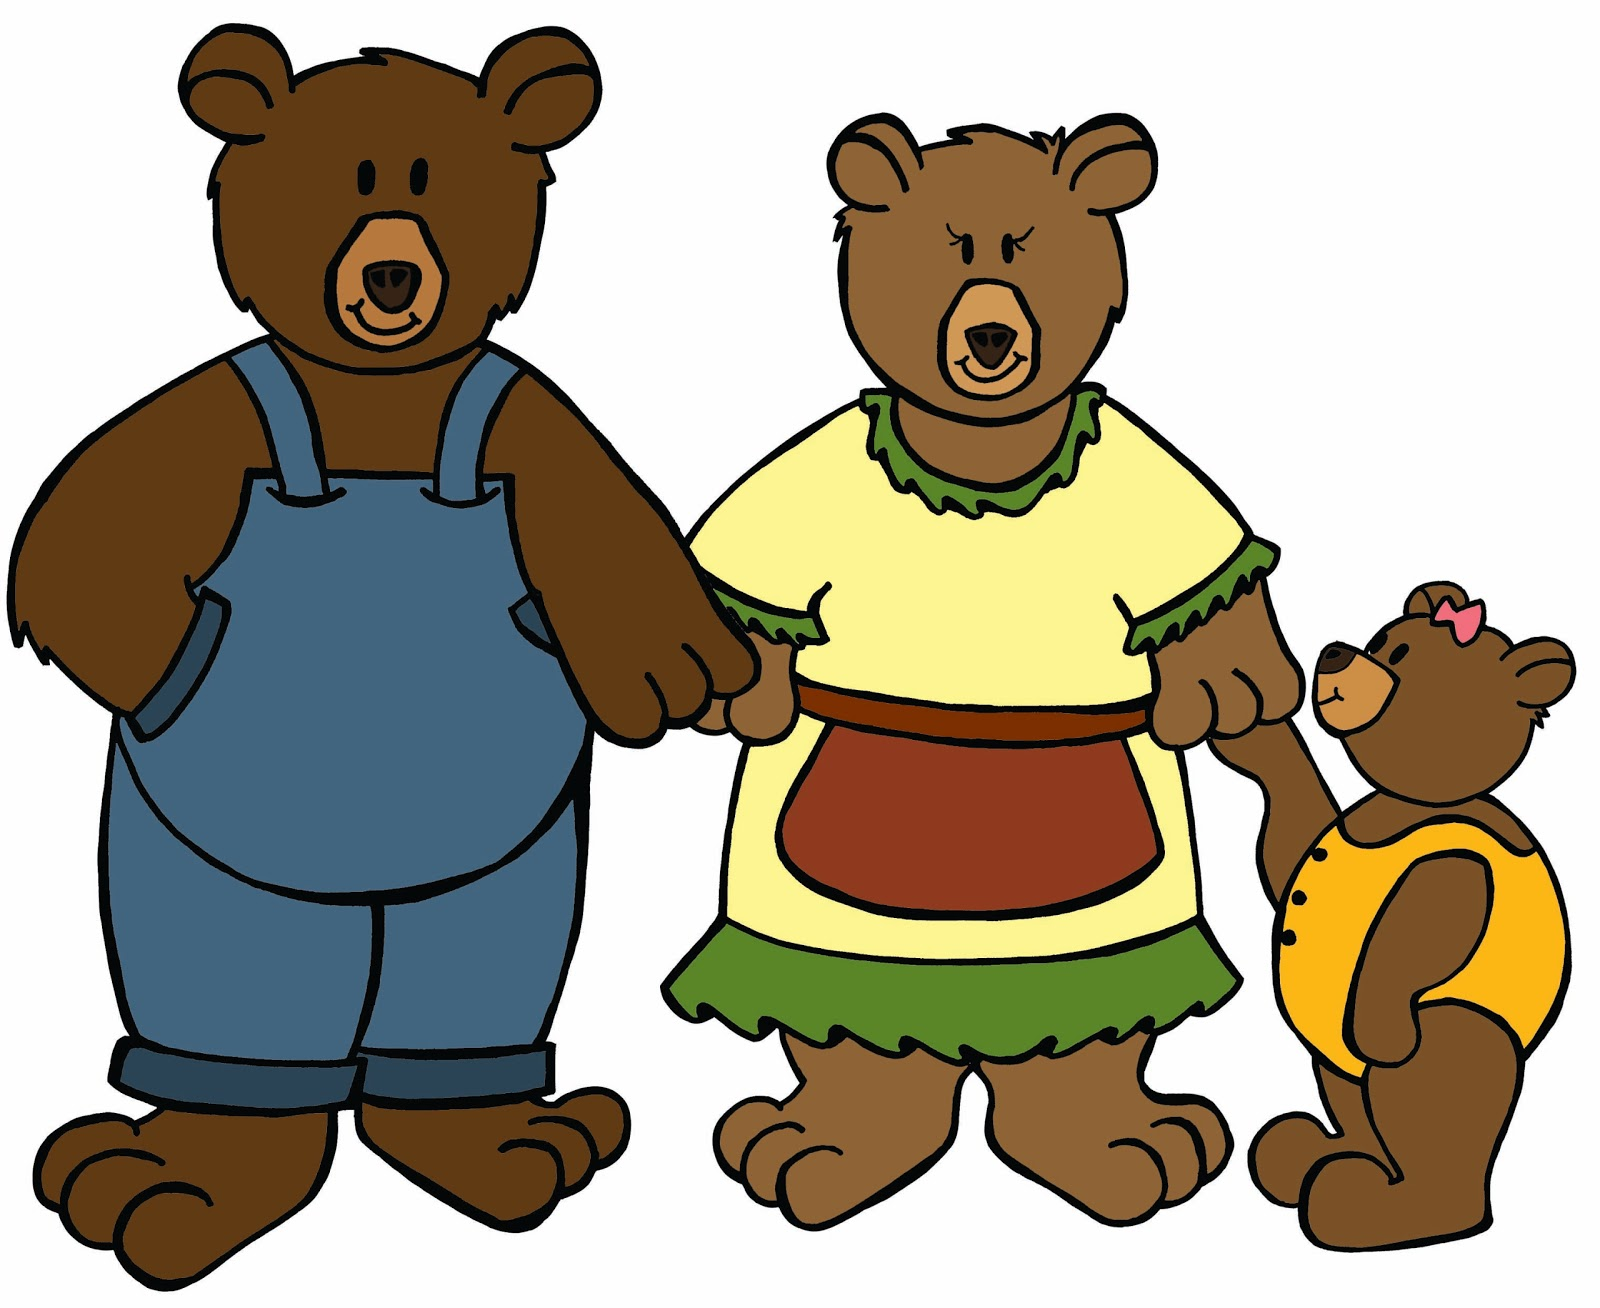 kindergarten crayons meet the bear family rh kindergartencrayons blogspot com Creativity Clip Art Reading Clip Art